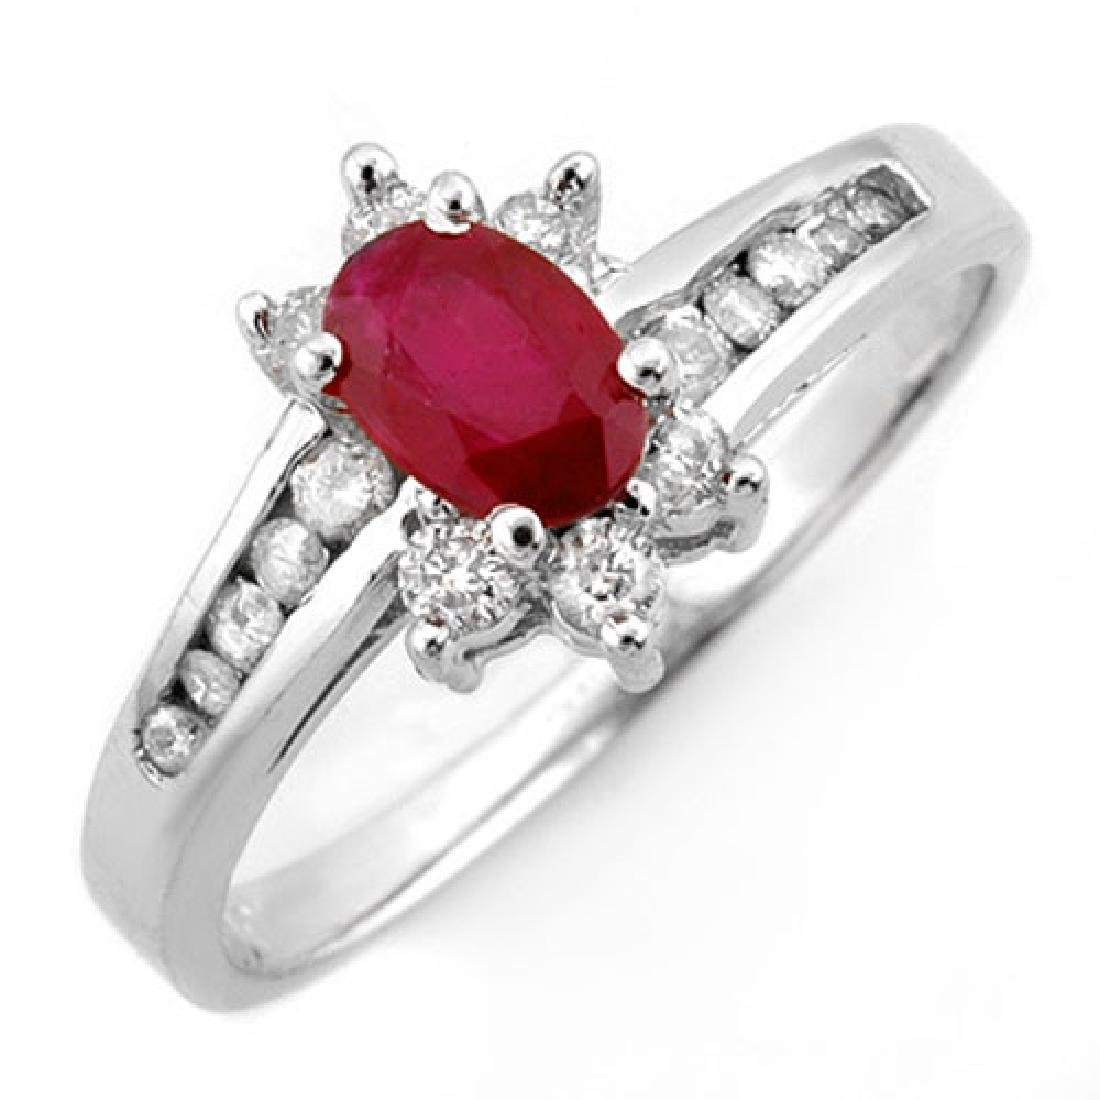 1.03 CTW Ruby & Diamond Ring 10K White Gold